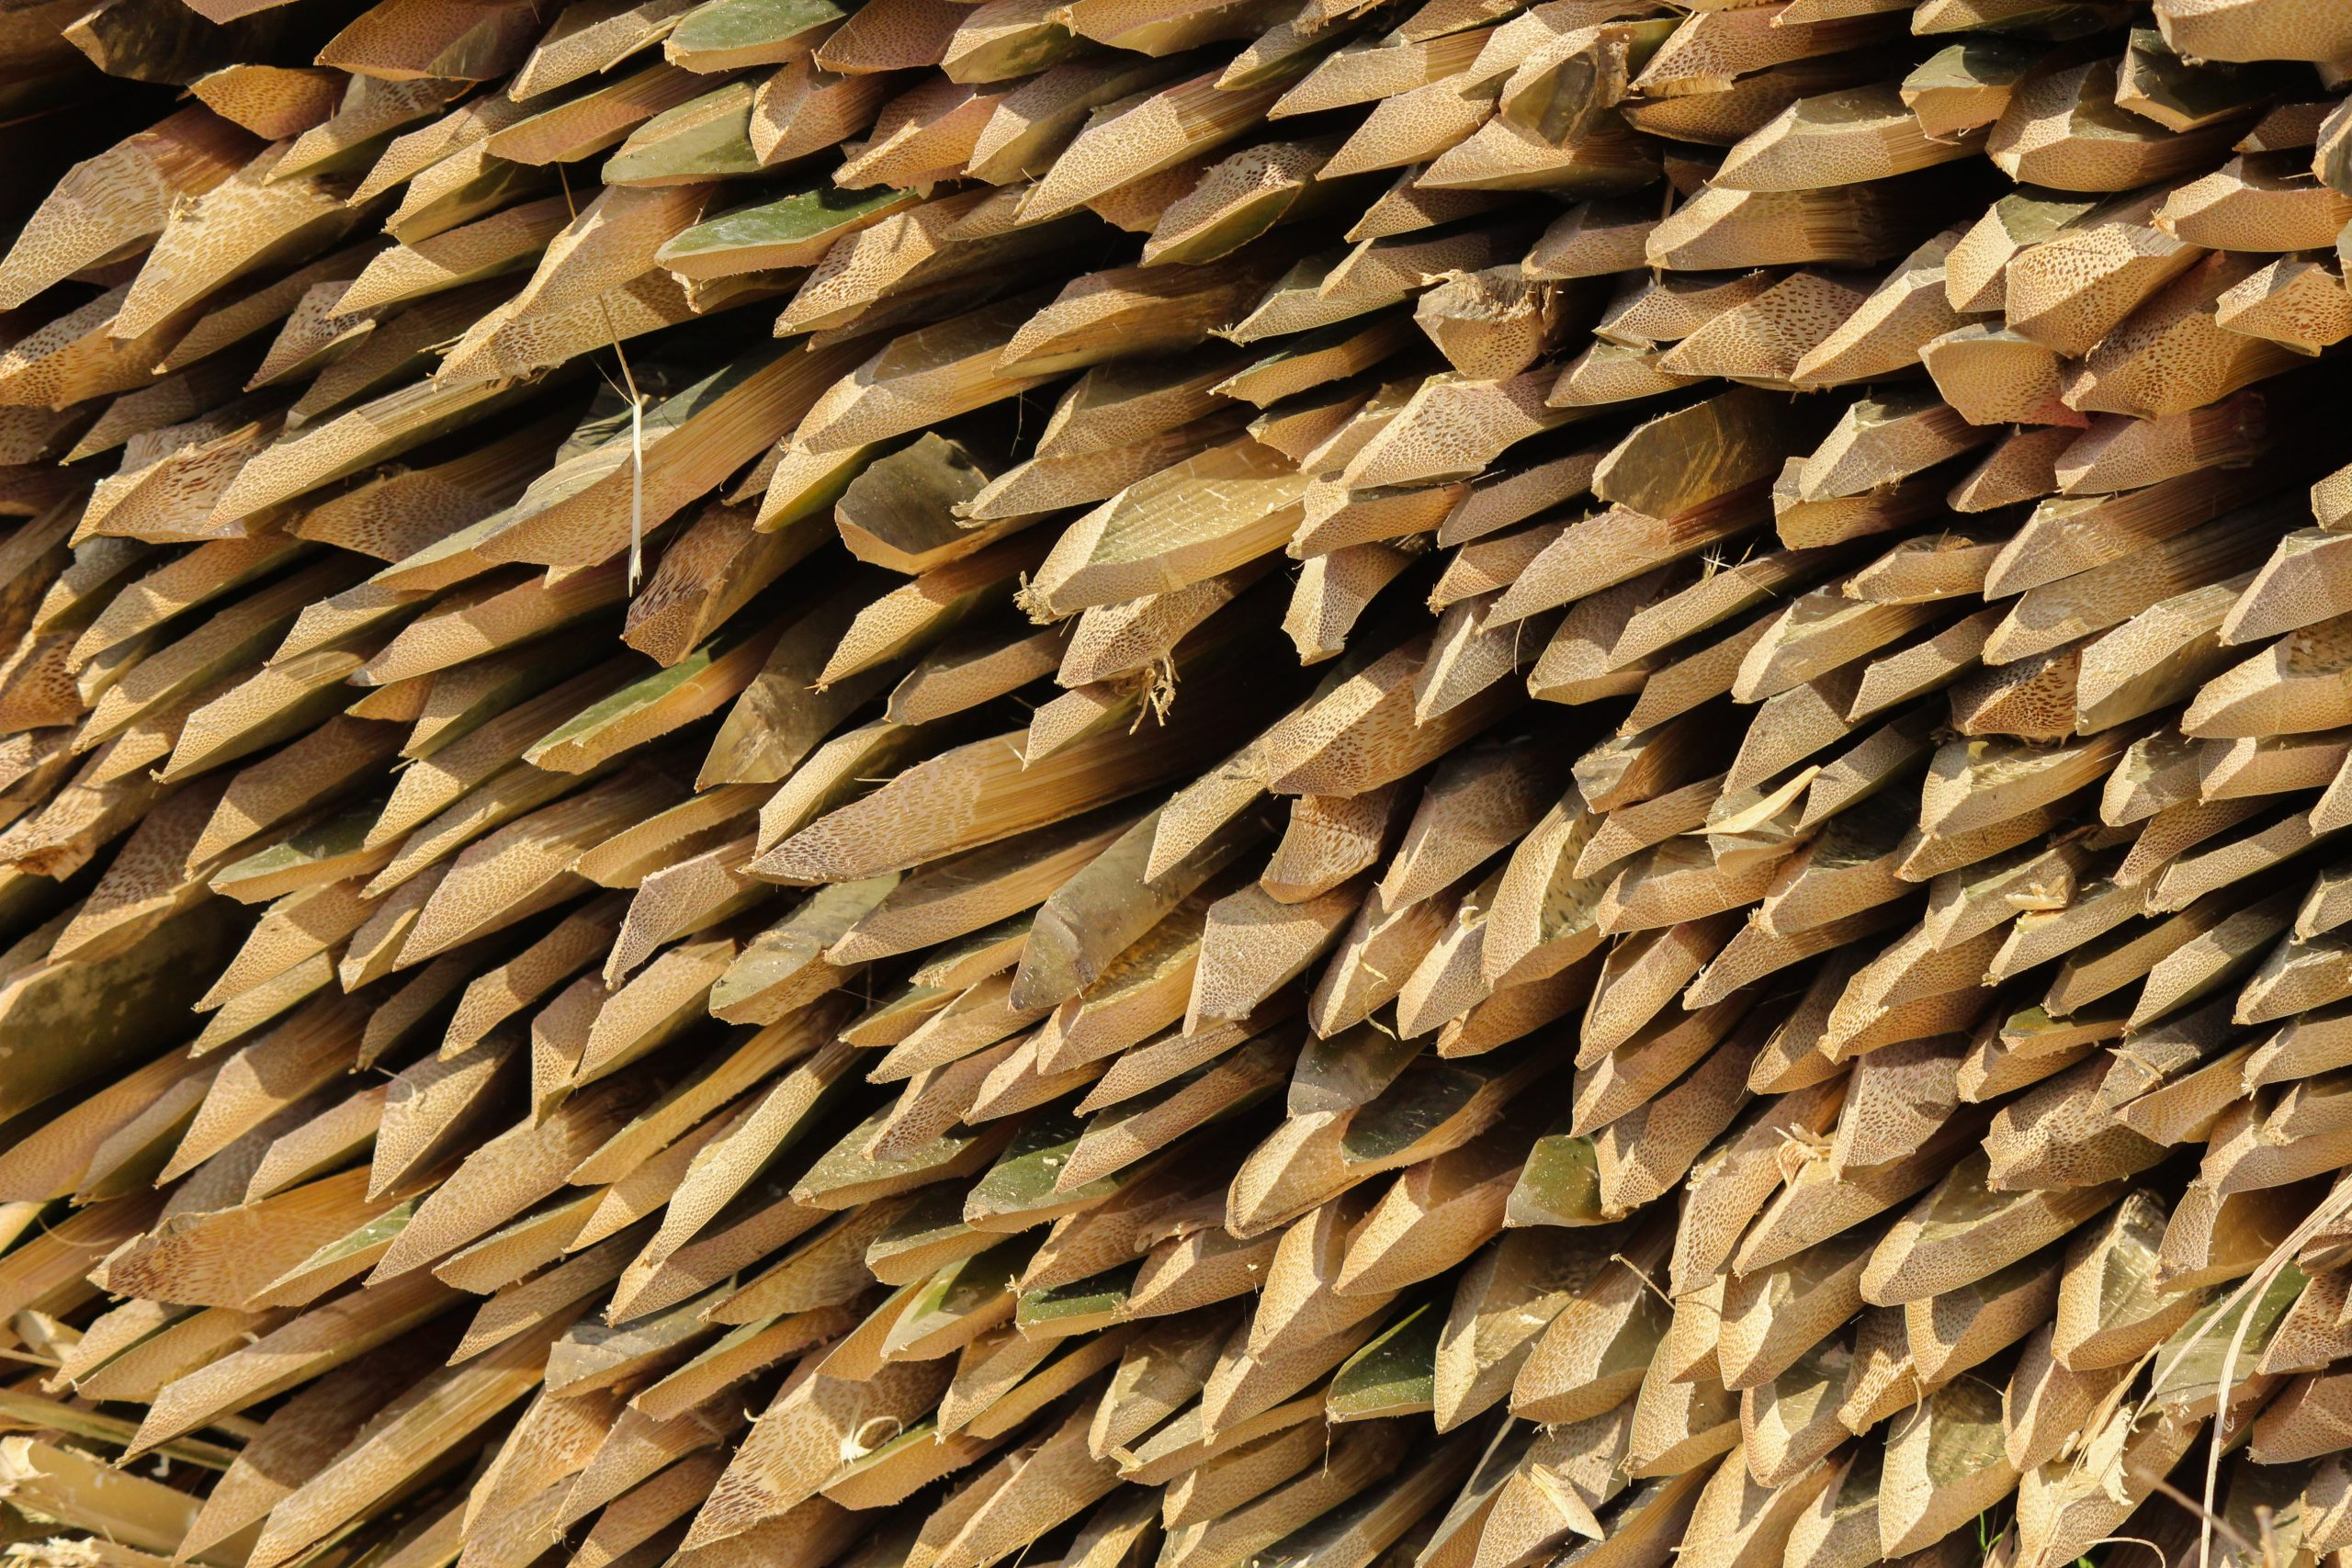 Pointy Bamboo Sticks